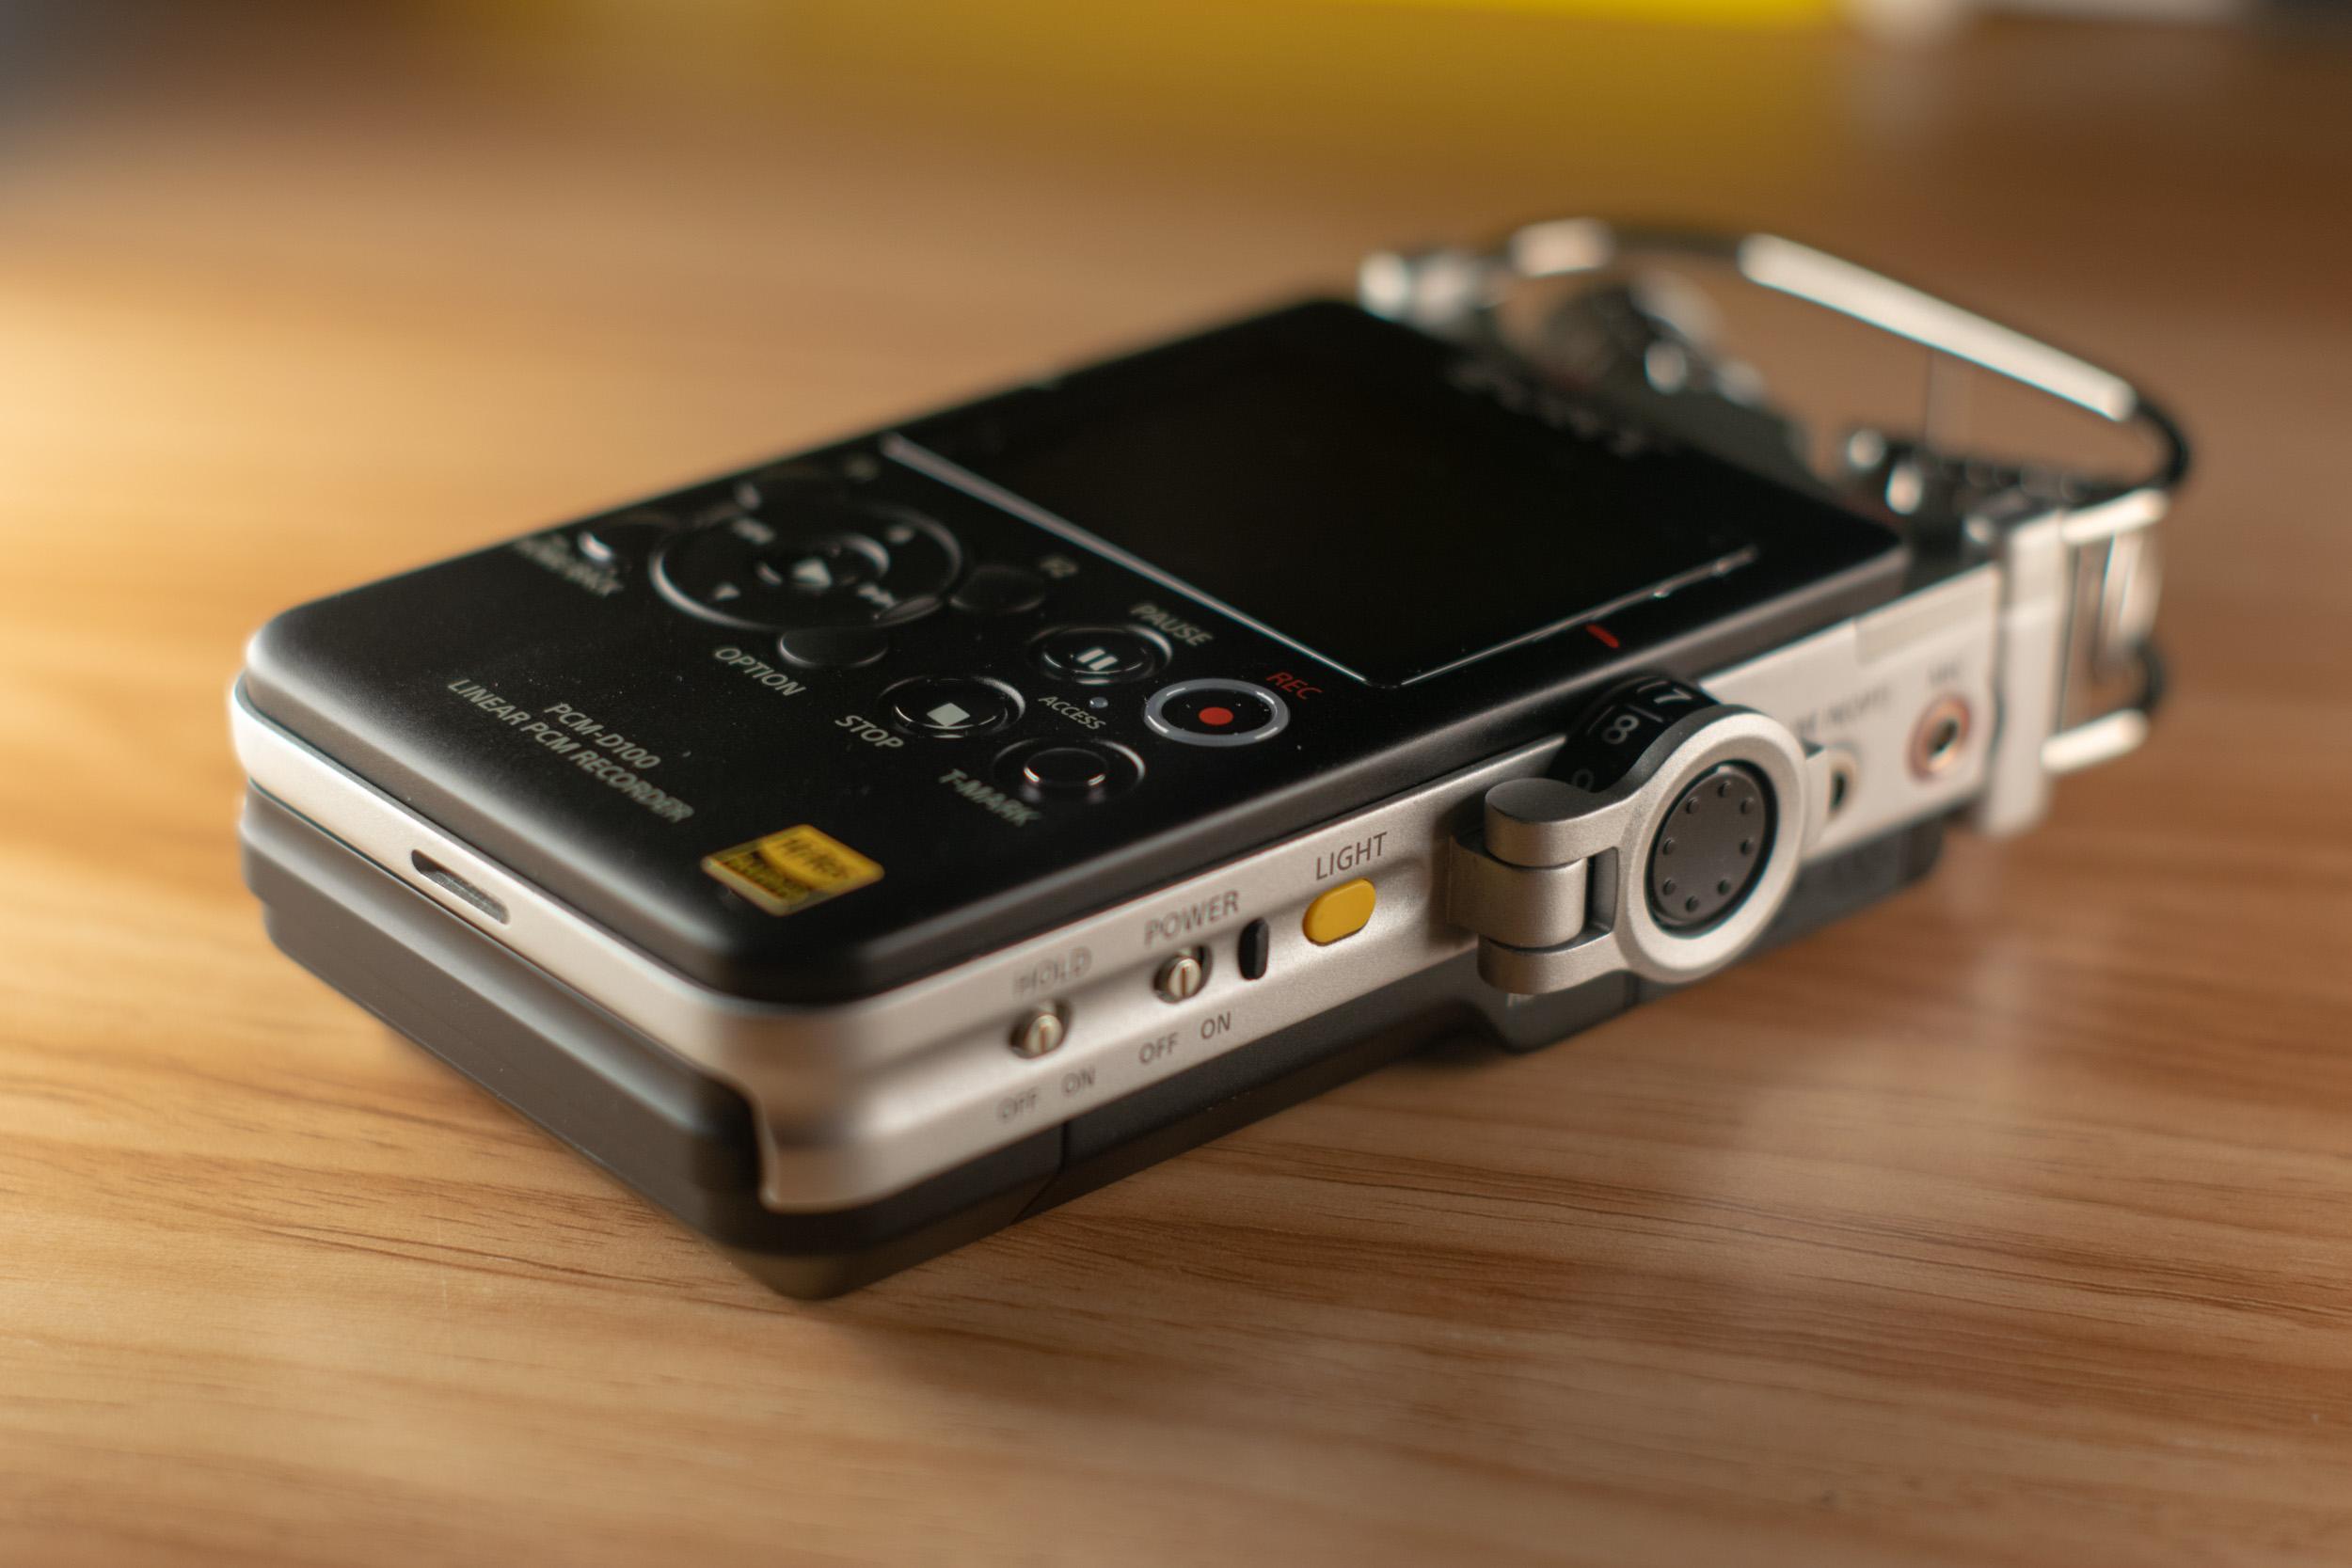 Sony PCM-D100-1  Side View.jpg